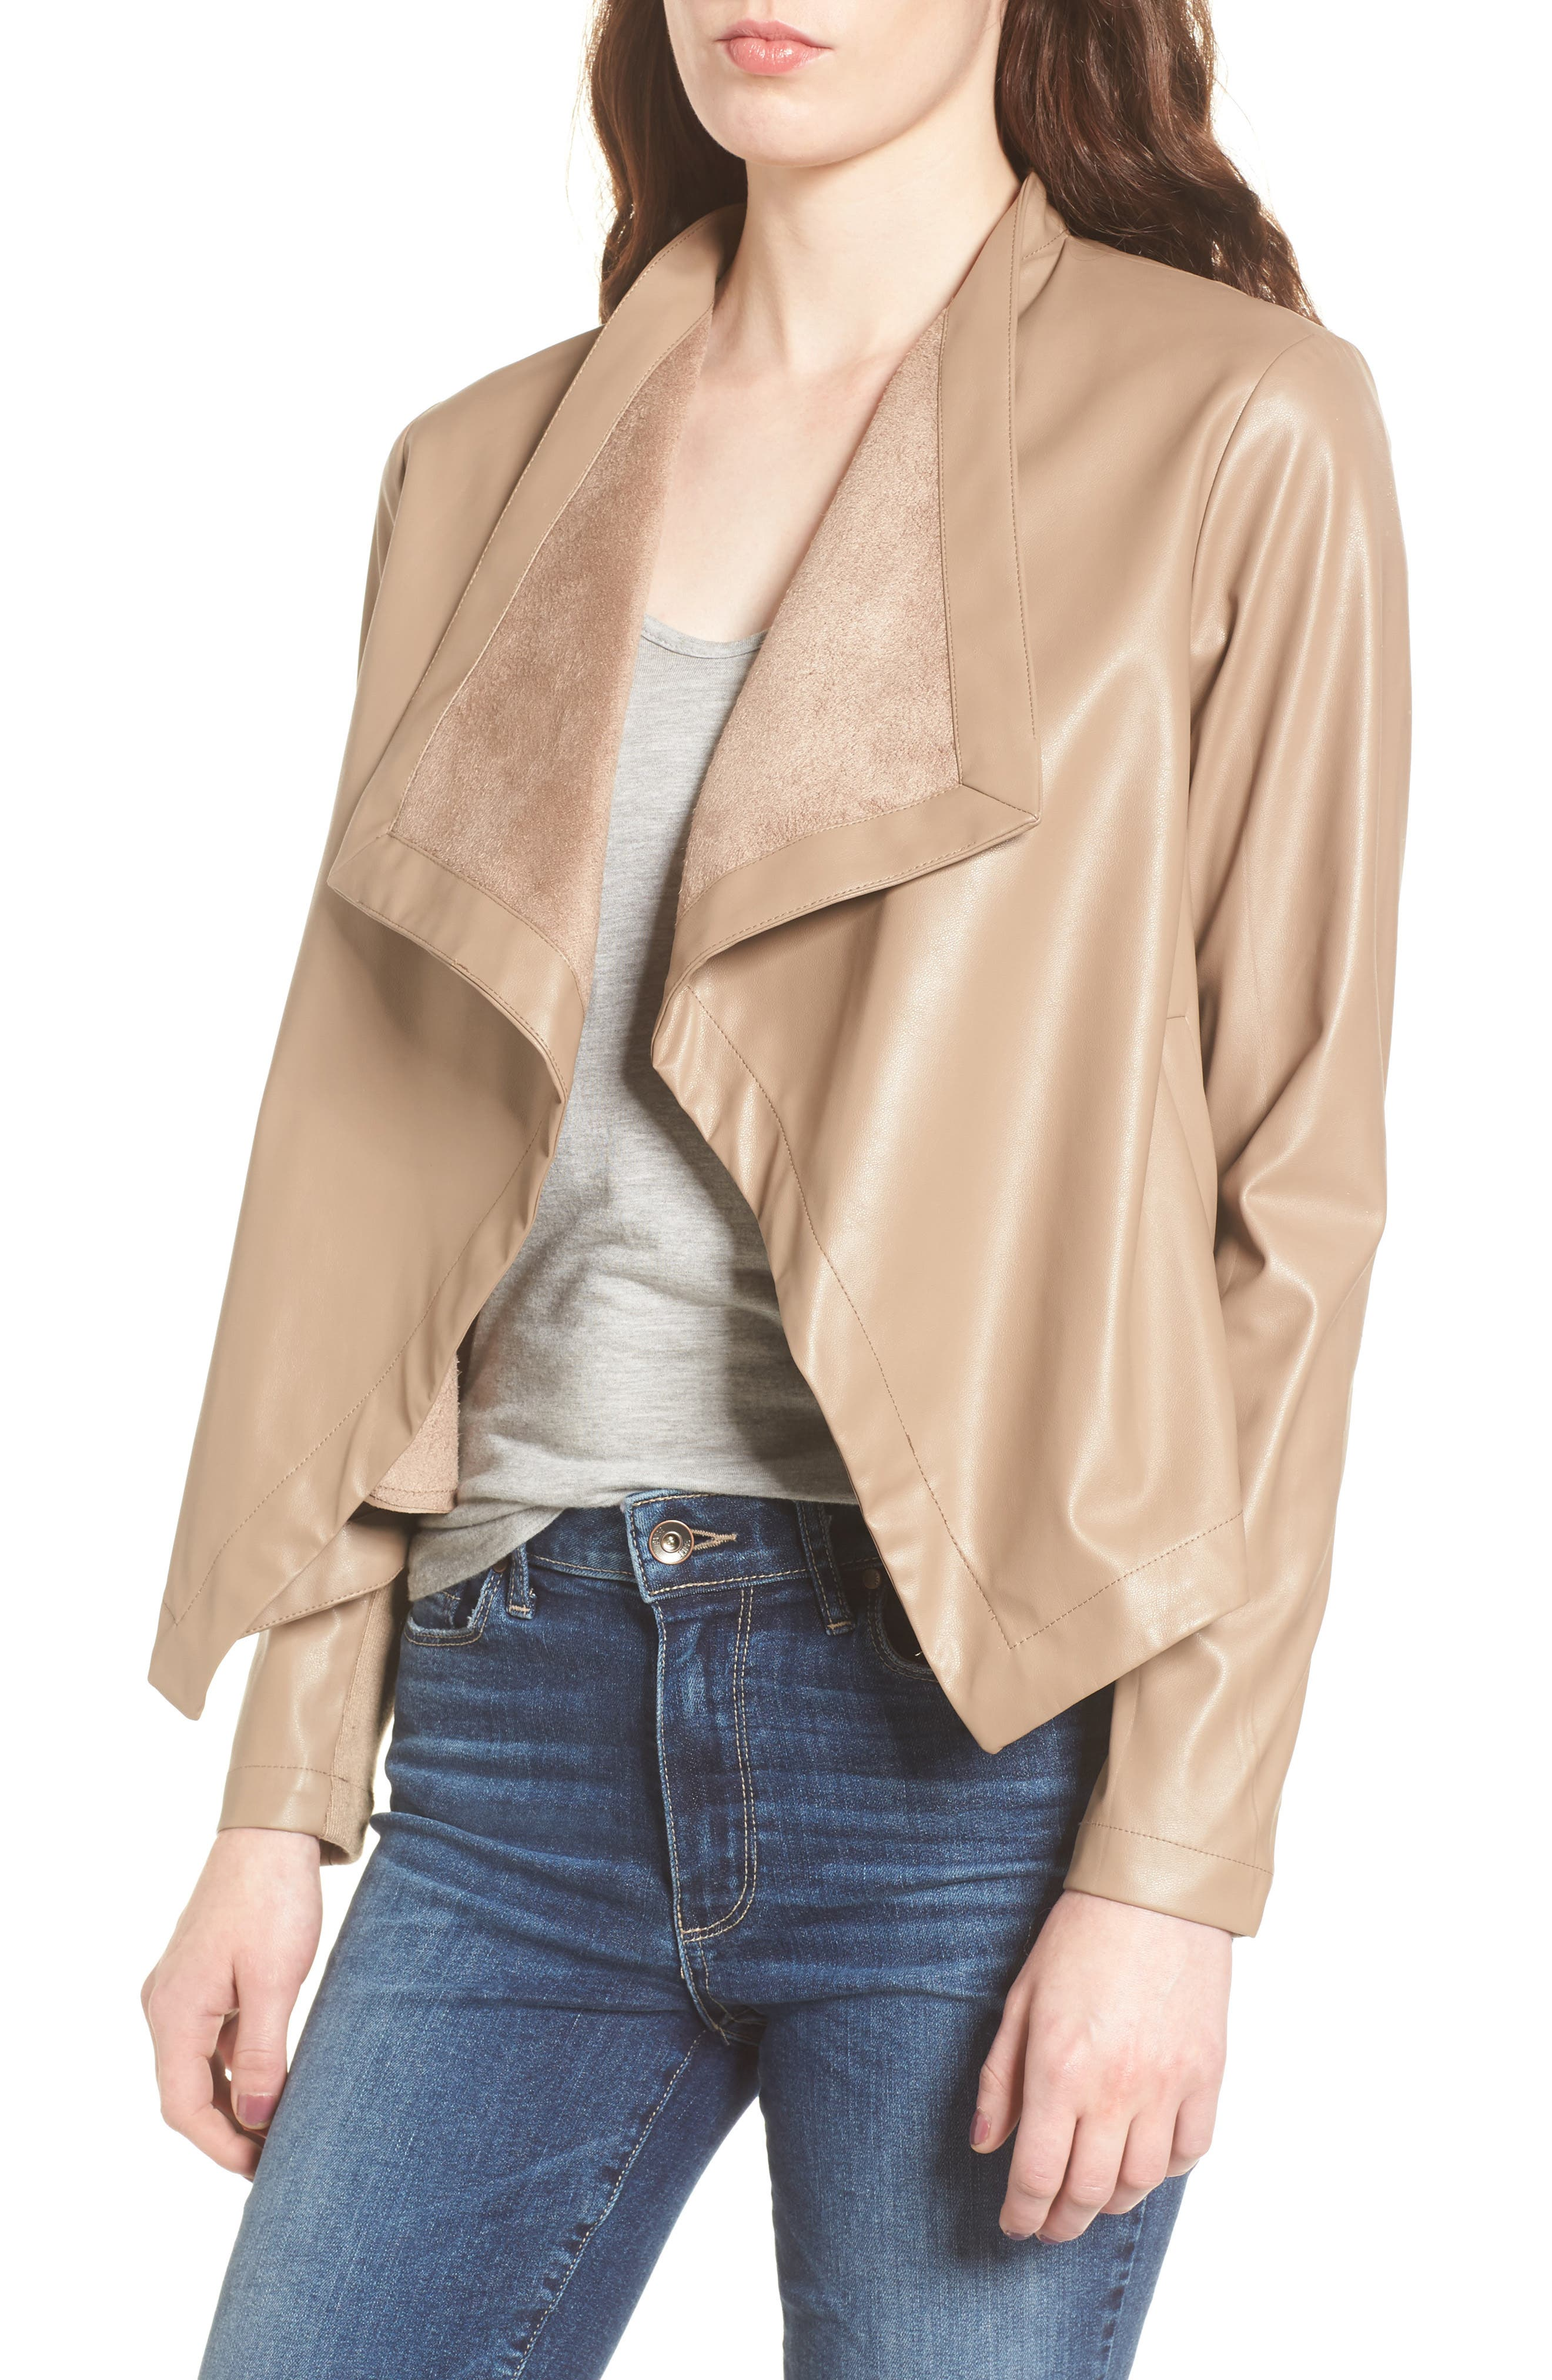 Main Image - BB Dakota 'Peppin' Drape Front Faux Leather Jacket